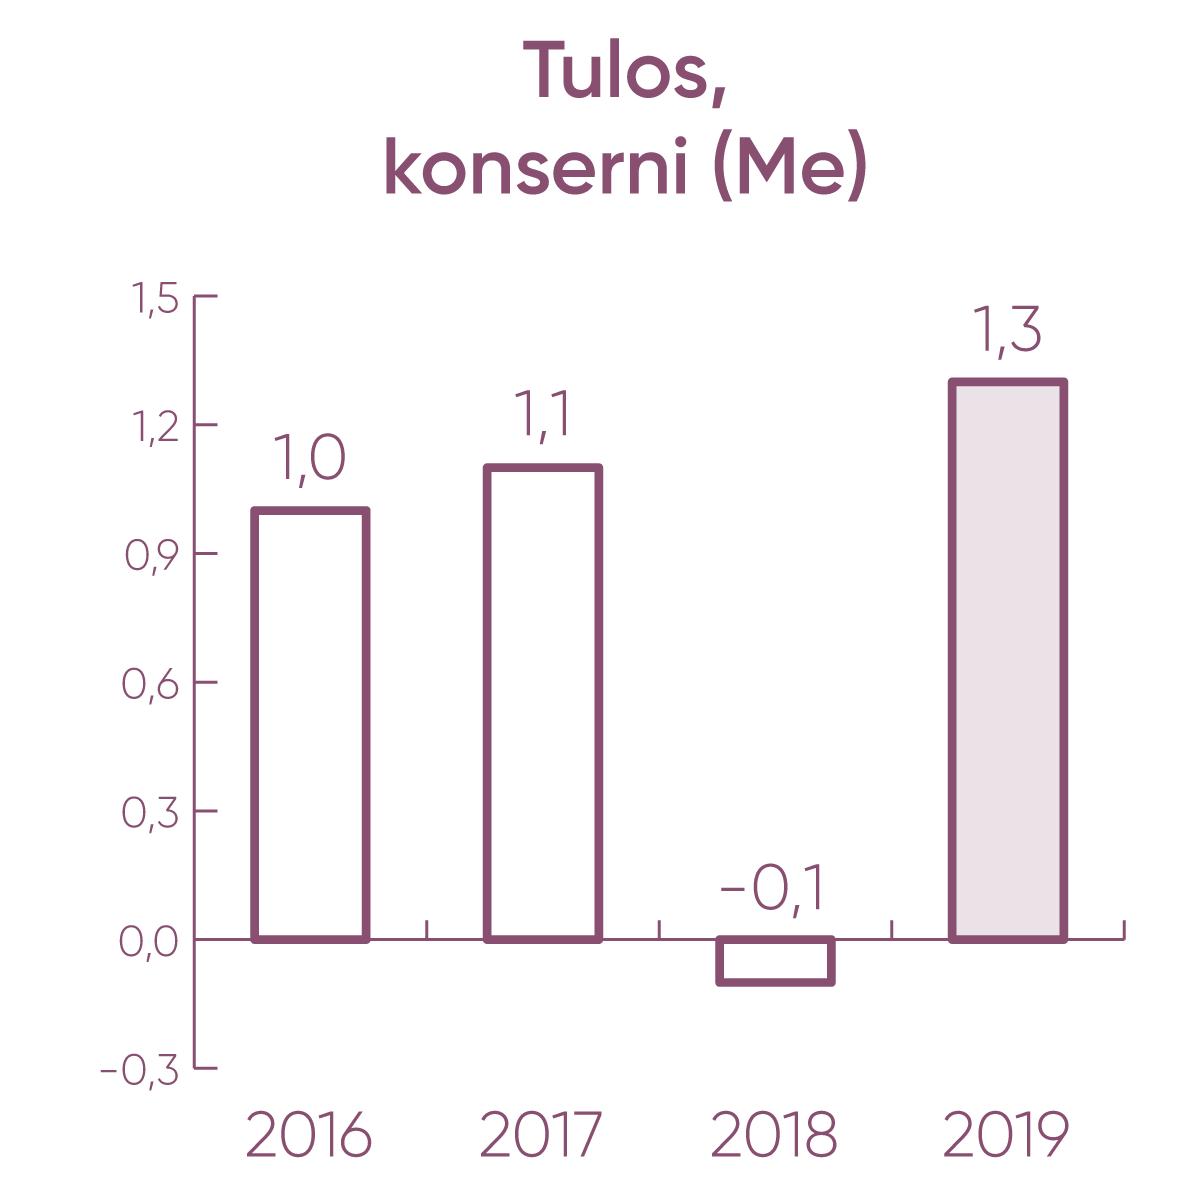 Tulos JYY-konserni (Me): 2016: 1,0 2017: 1,1 2018: -0,1 2019: 1,3